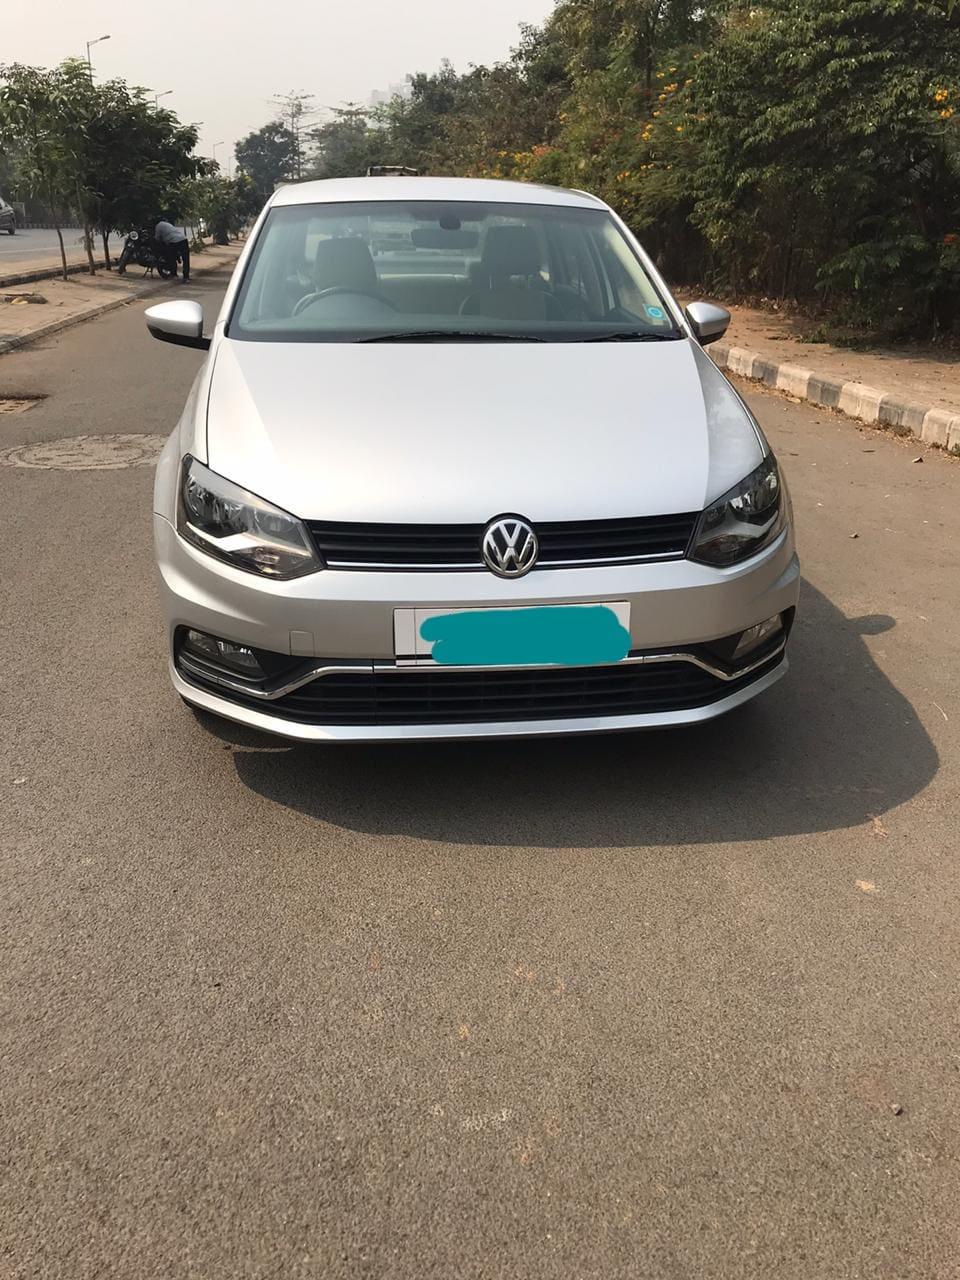 Volkswagen Ameo 1.5 TDI Highline Plus